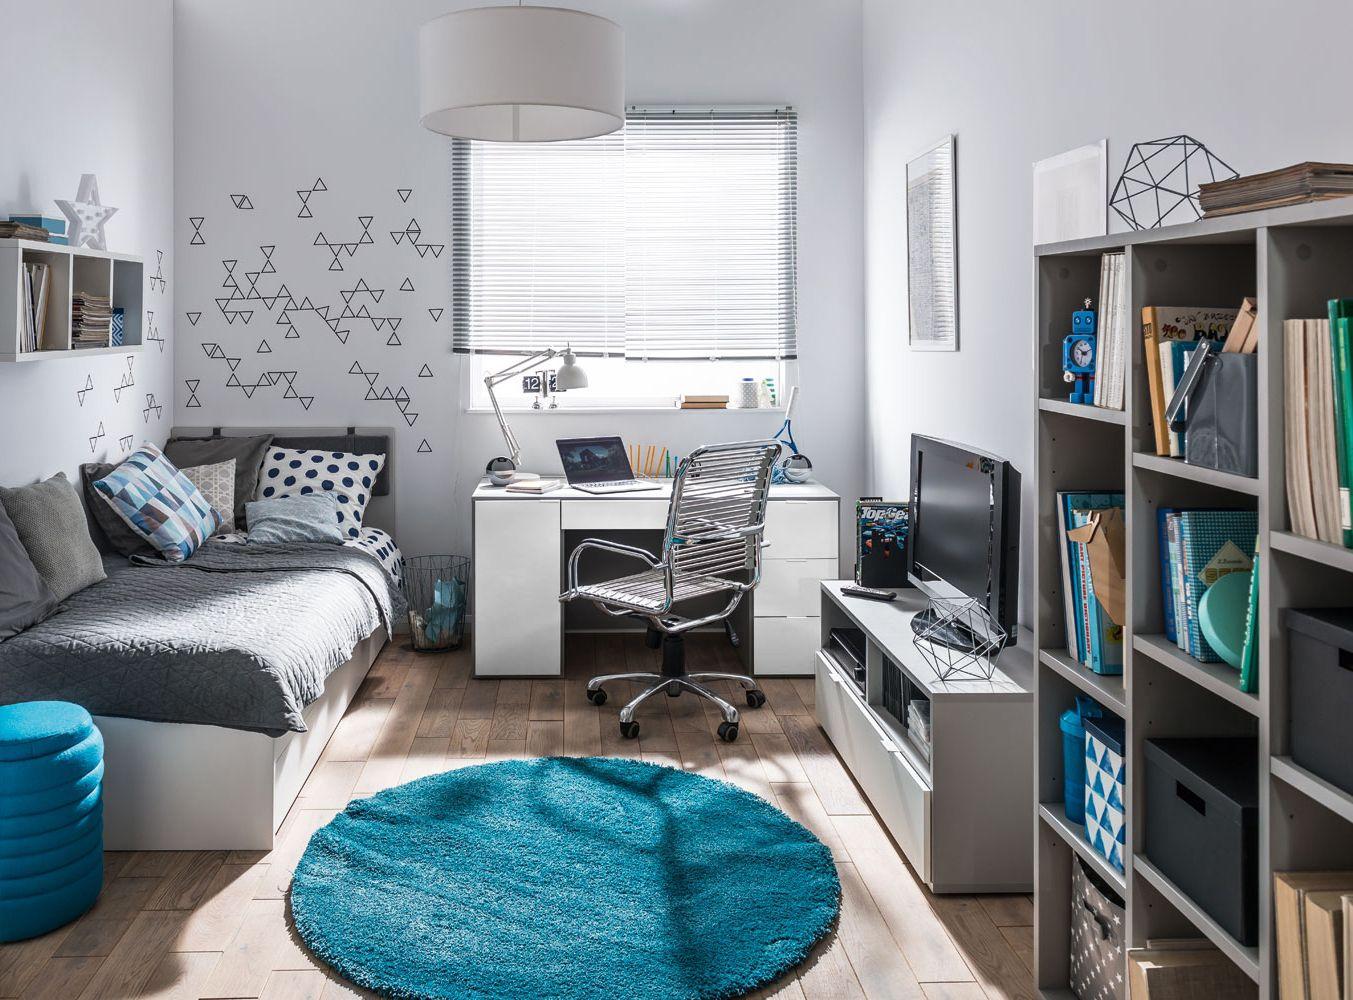 Jugendzimmer Komplett Set B Bellaco 6 Teilig Farbe Weiss Grau